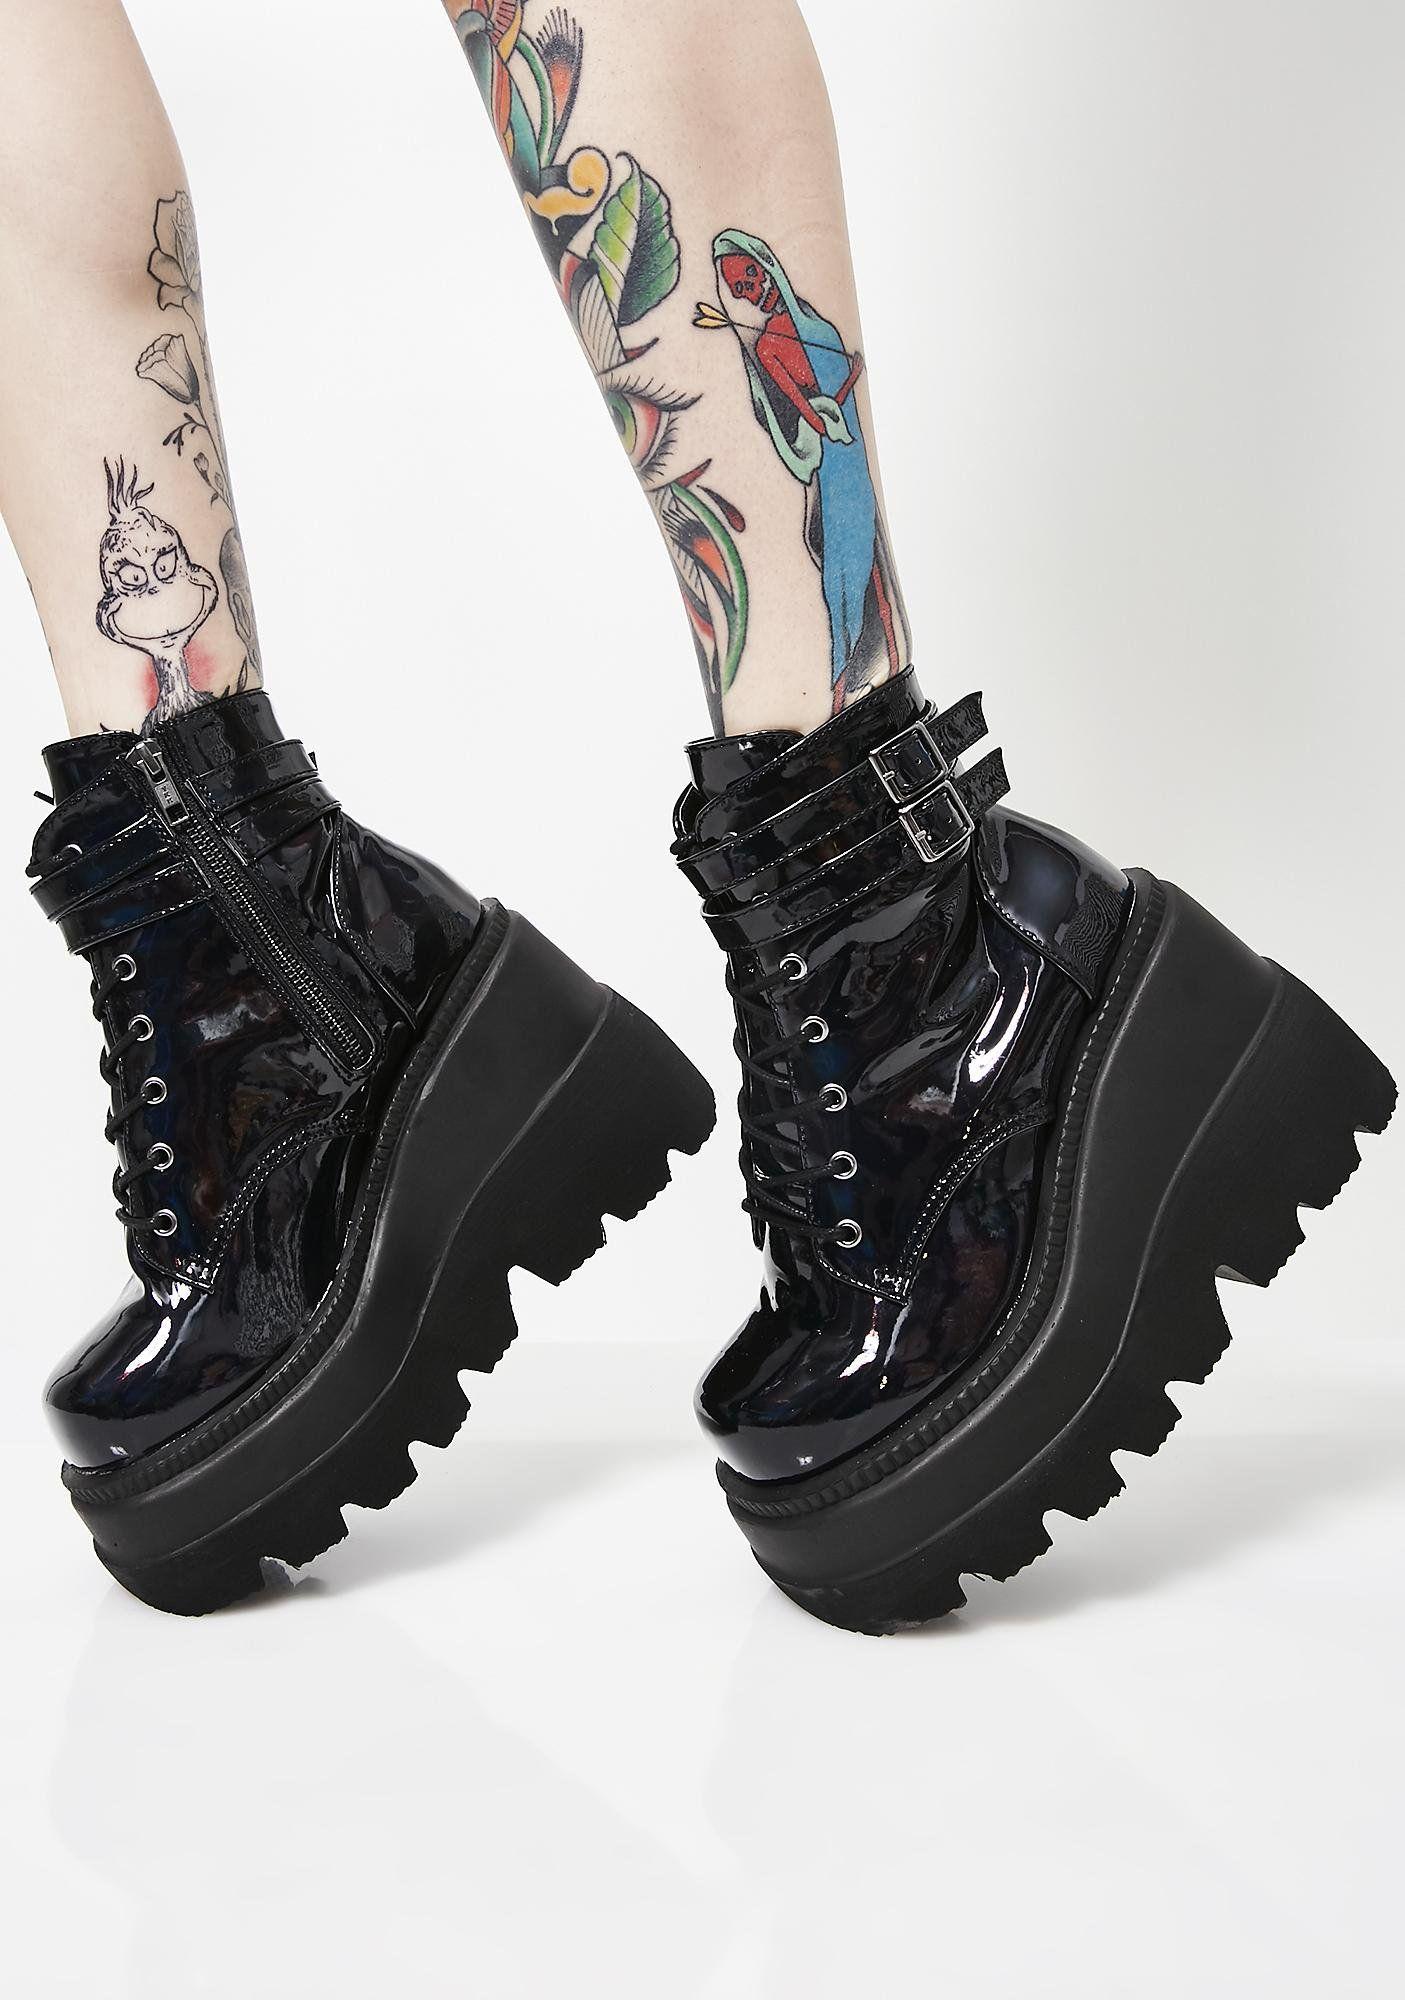 fee88d24729a Dark Prism Technopagan Boots in 2019